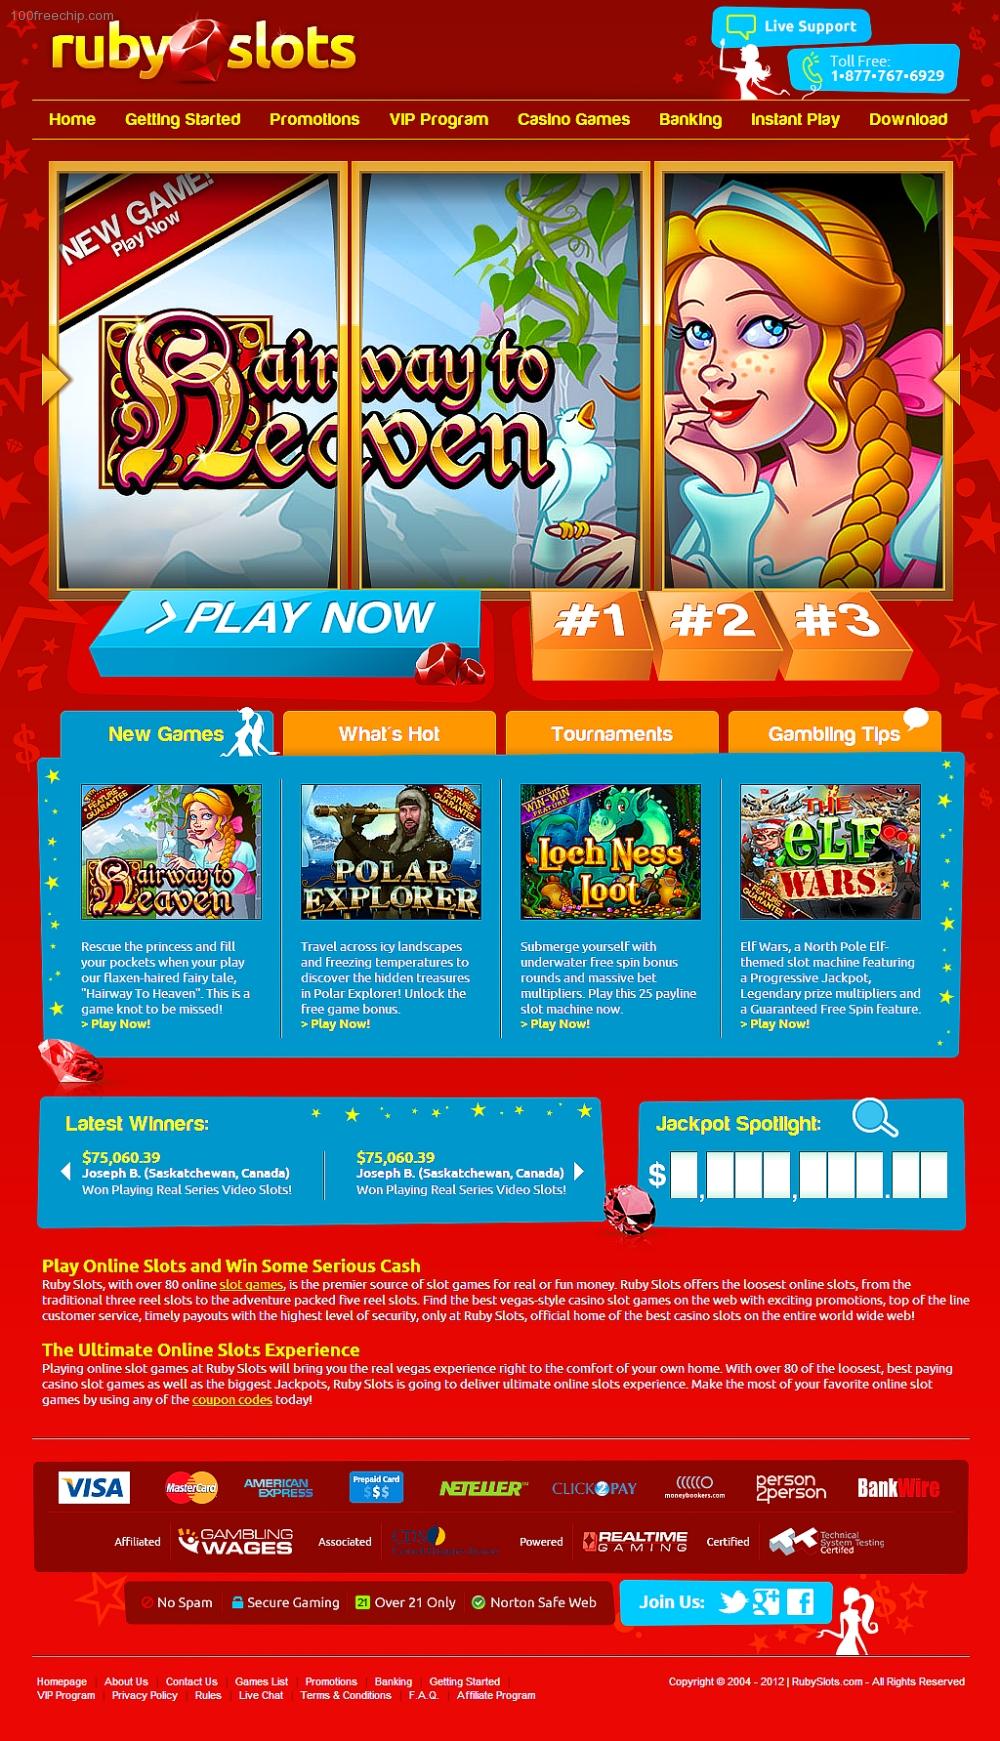 Ruby Slots Casino 100 Free Chip